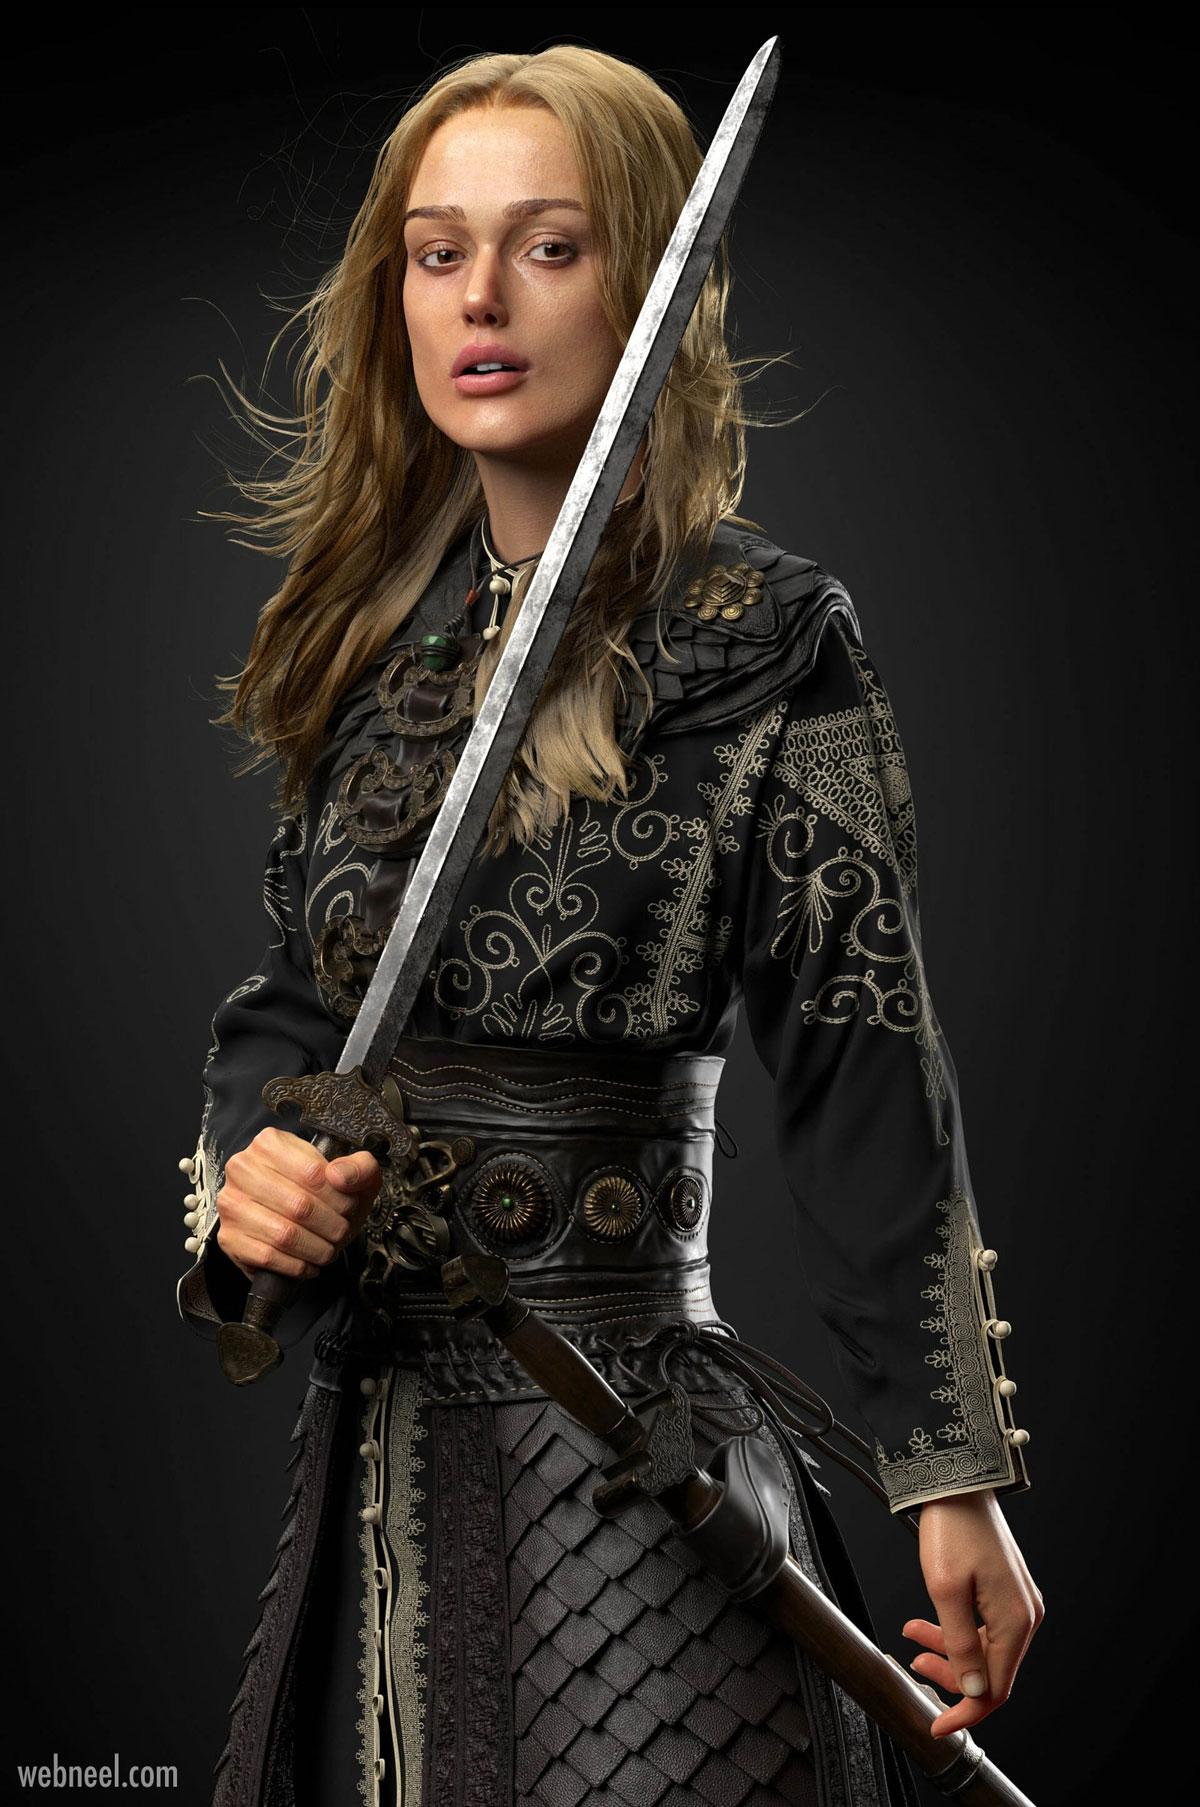 3d model fantasy girl game character fighter